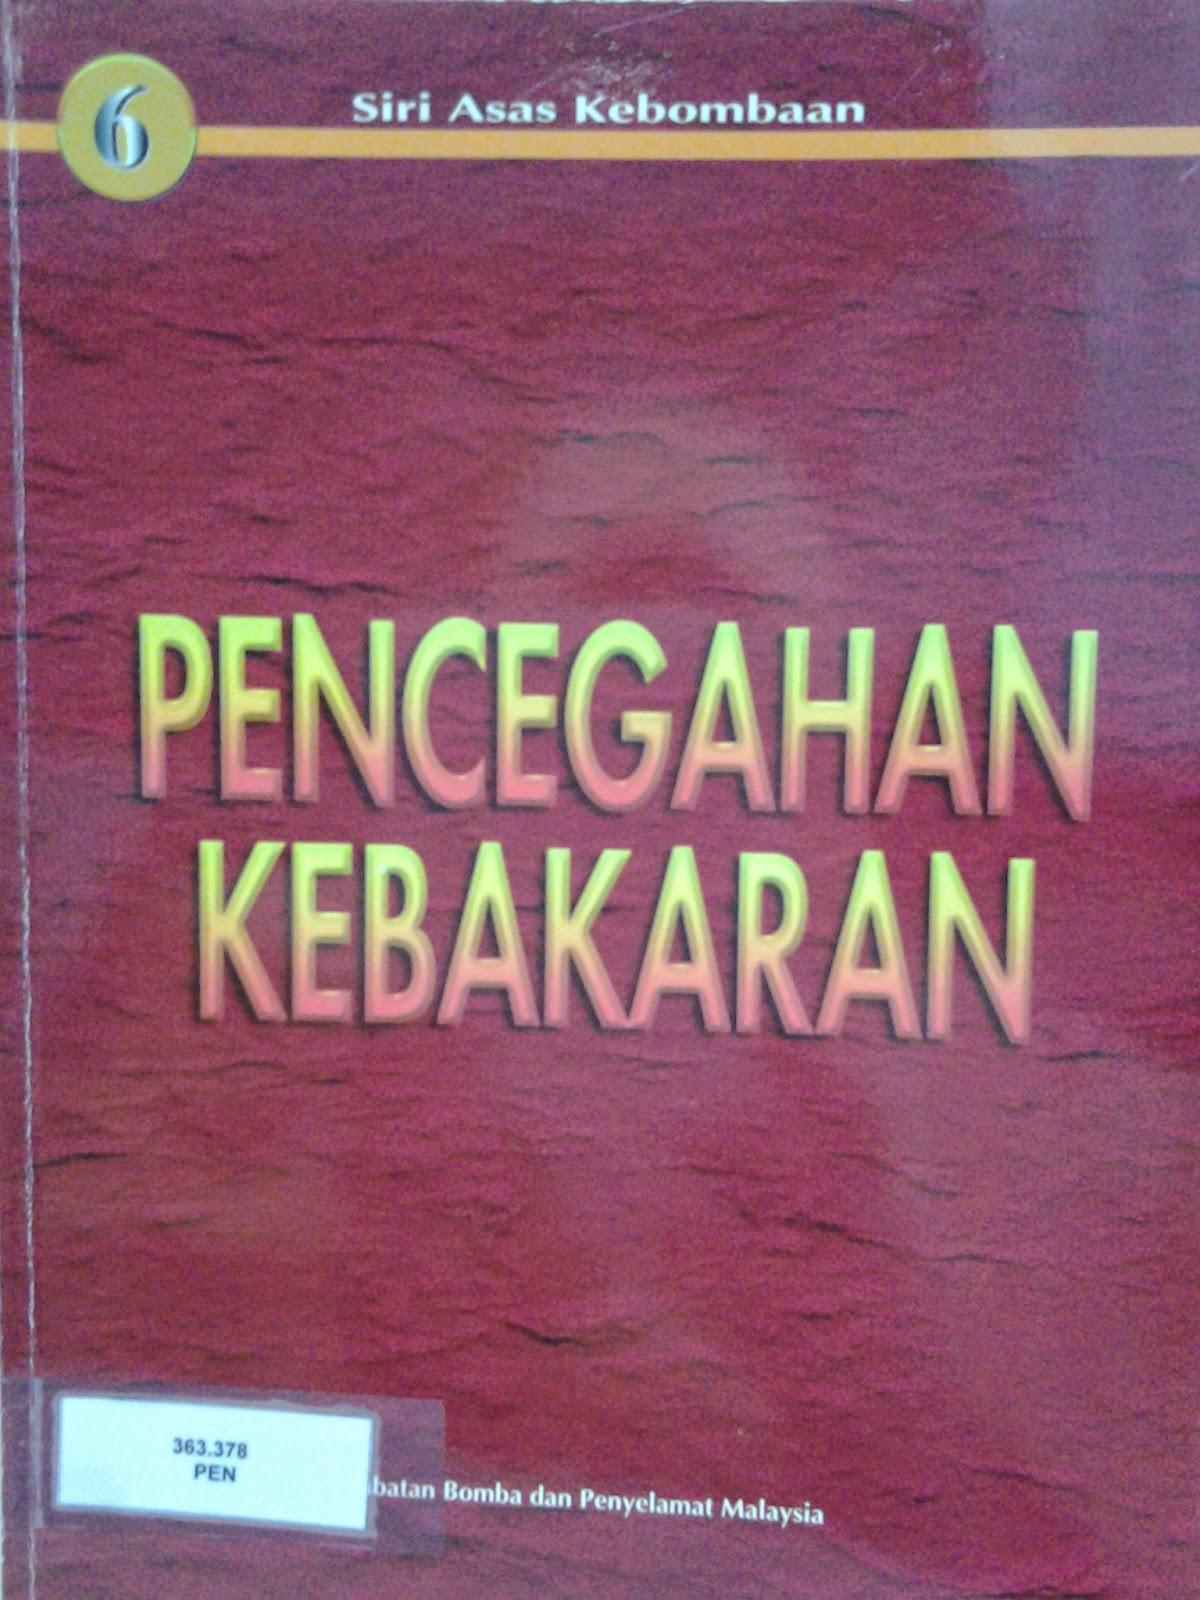 http://perpustakaanjbpm.blogspot.my